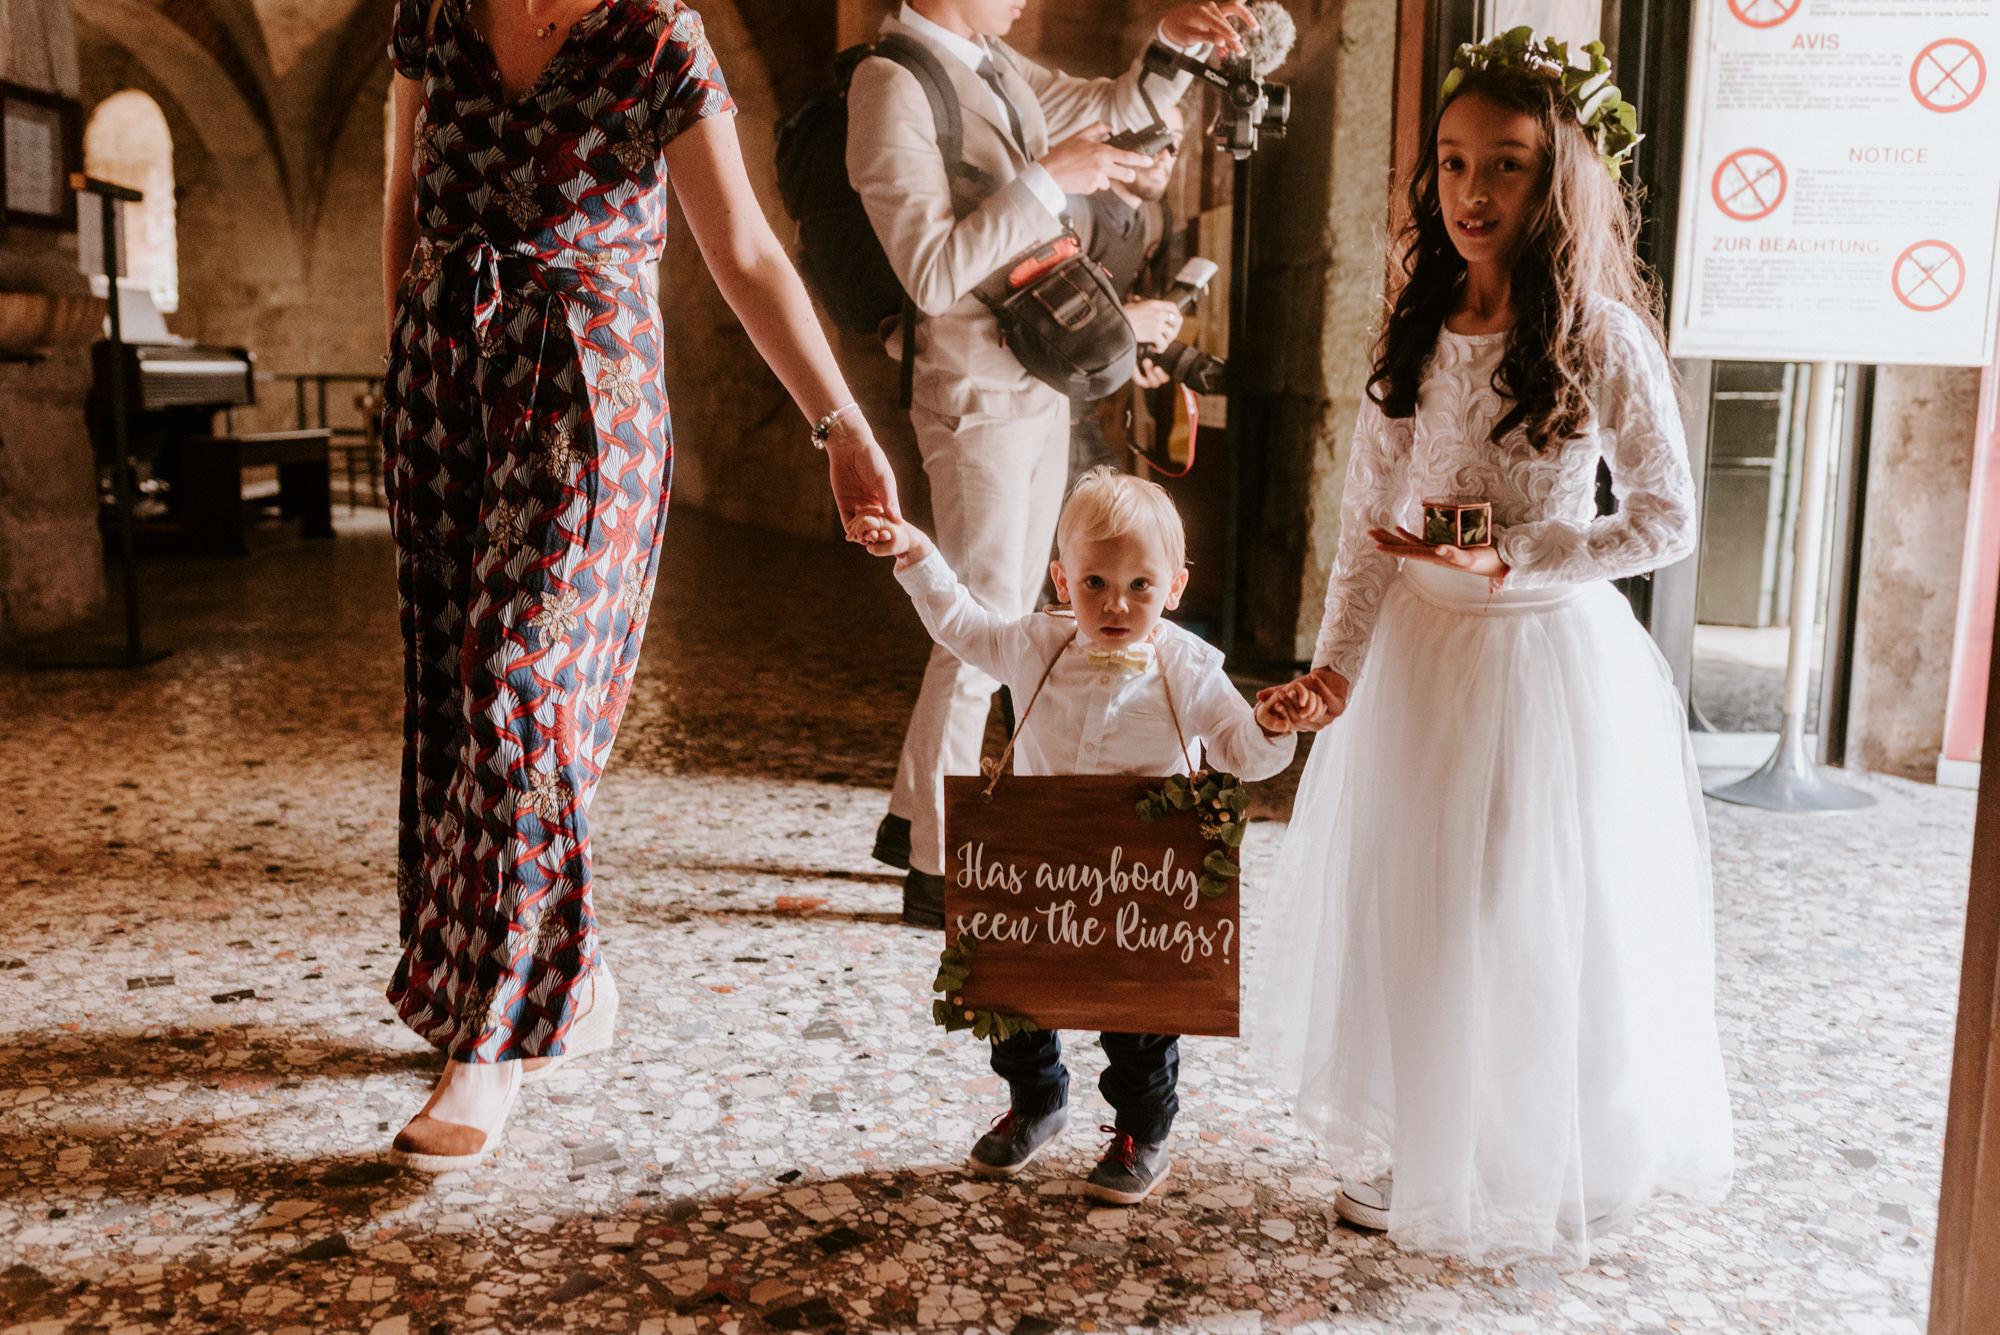 FOTO+PHOTO+BODA+WEDDING+ITALIA+ITALY+MAURICIO+GARAY+MAURICIOGARAY+WEDDINPHOTOGRAPHER+FOTOGRAFODEBODA-733.jpg